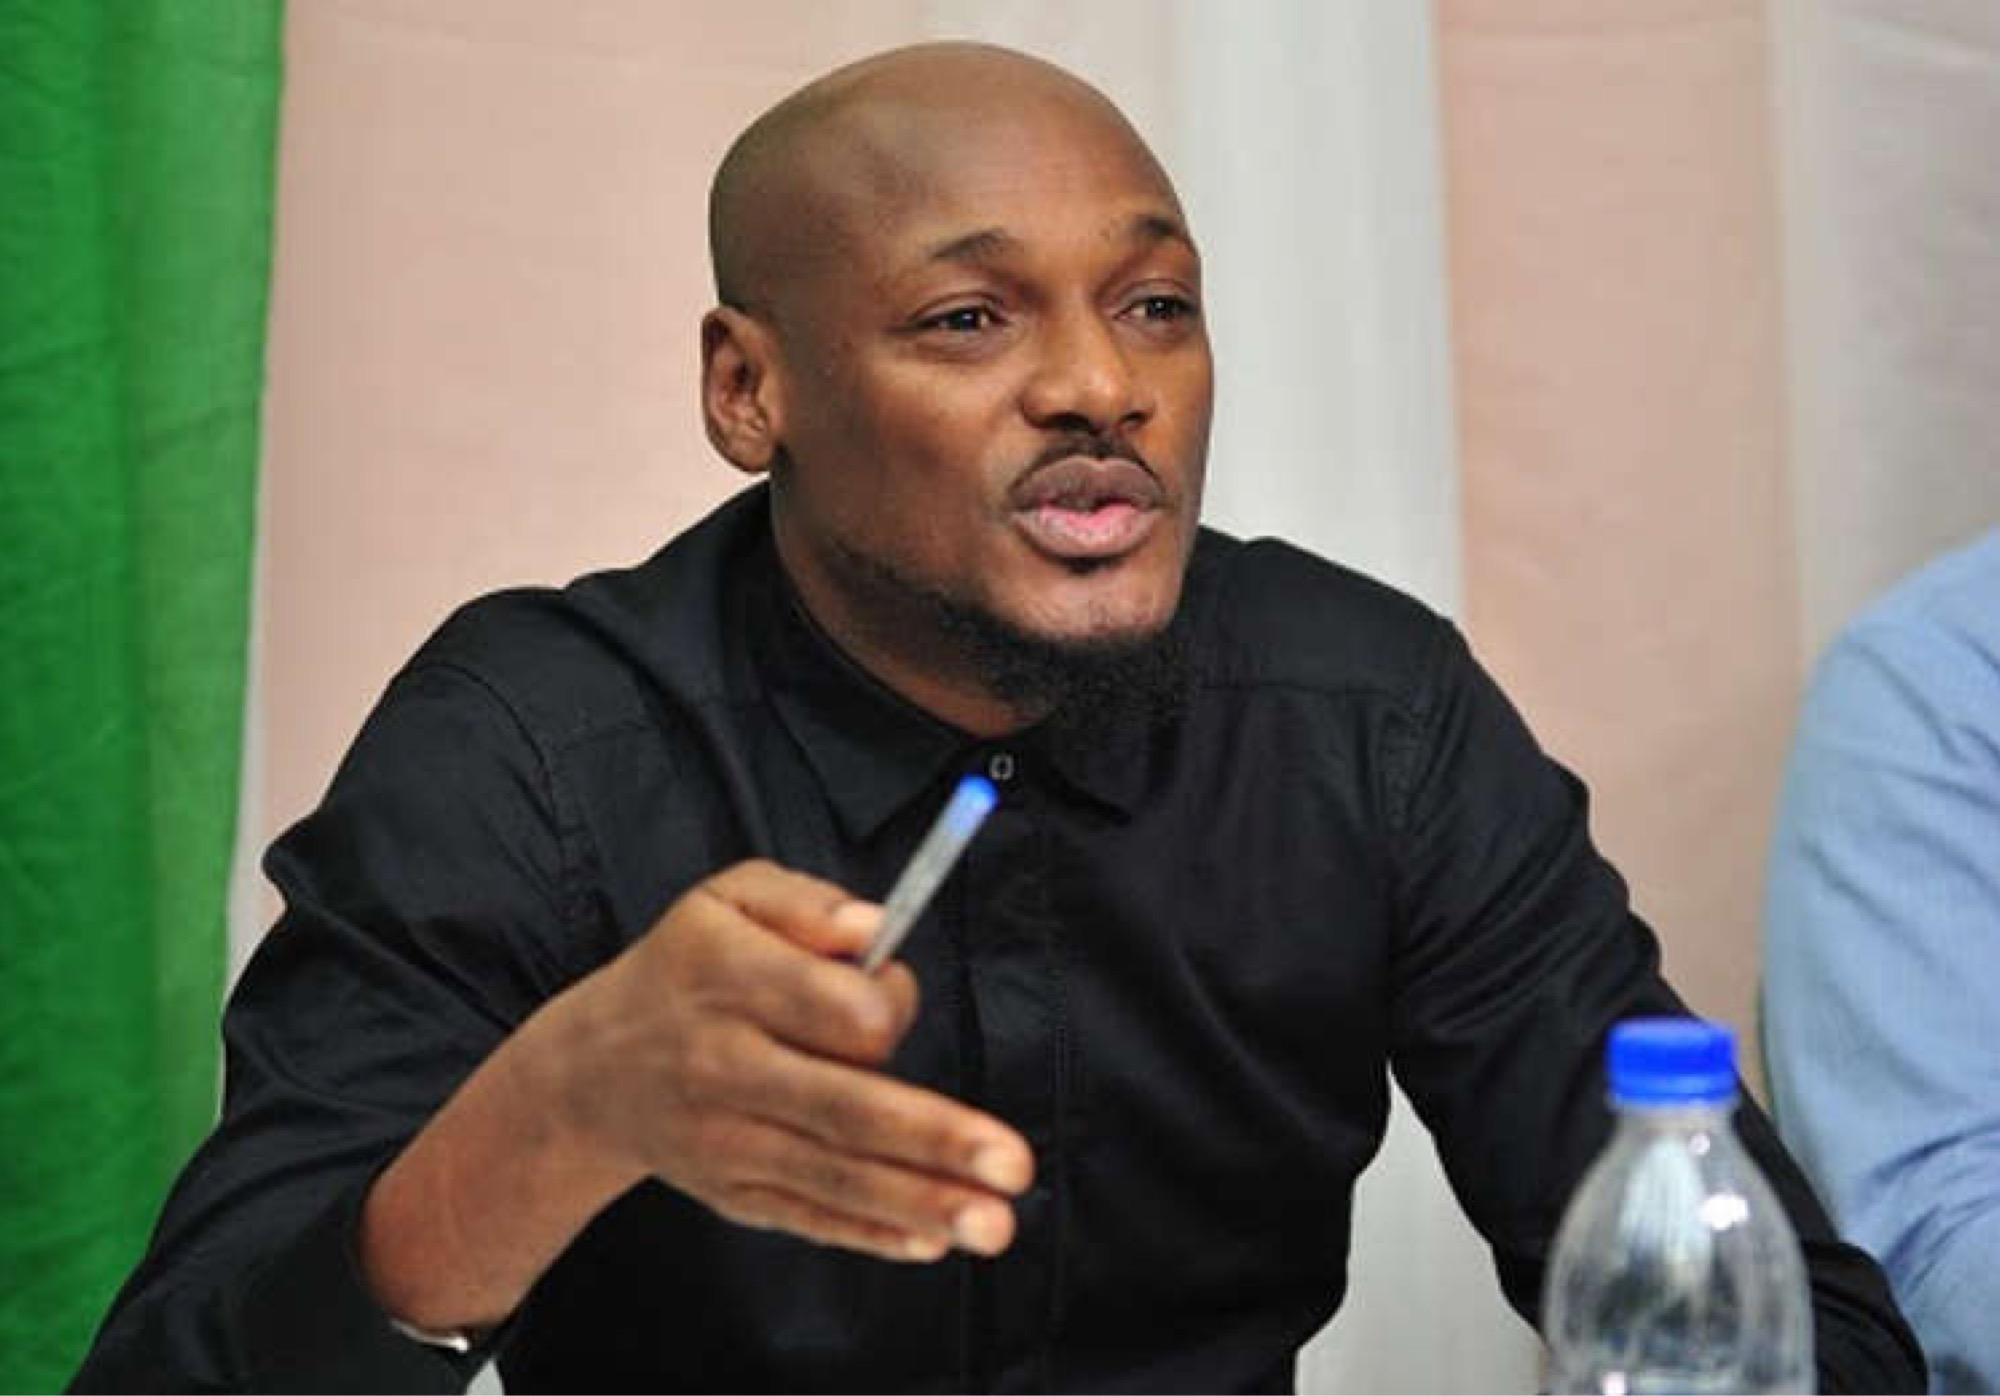 Singer 2face Slams Nigerian Government Over Proposed Social Media Regulation